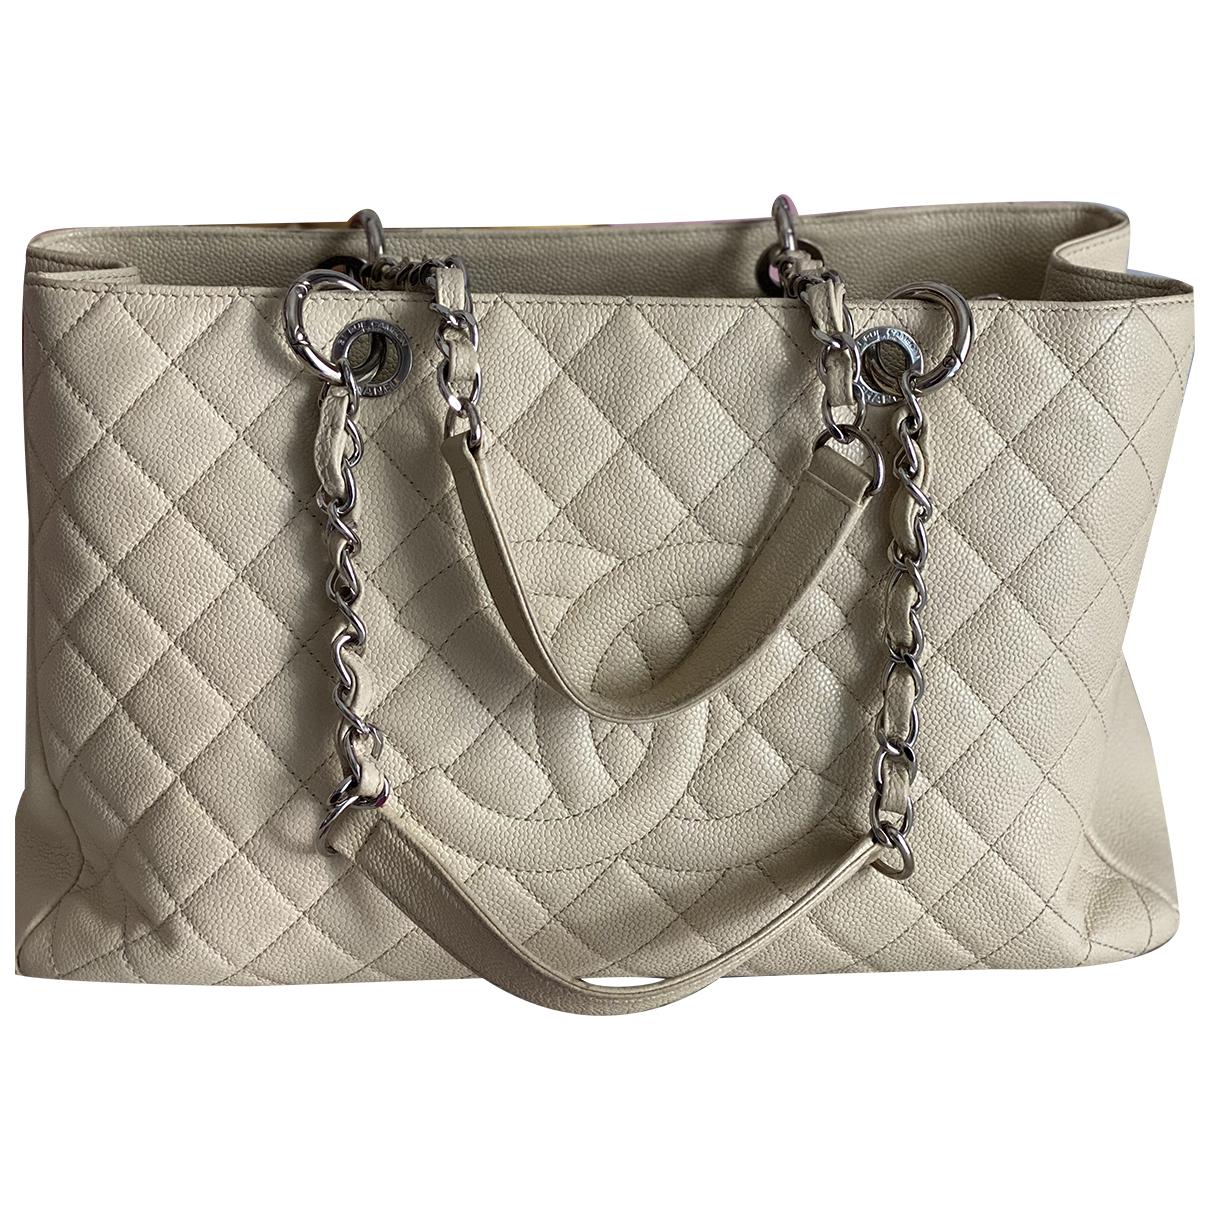 Chanel N Leather handbag for Women N